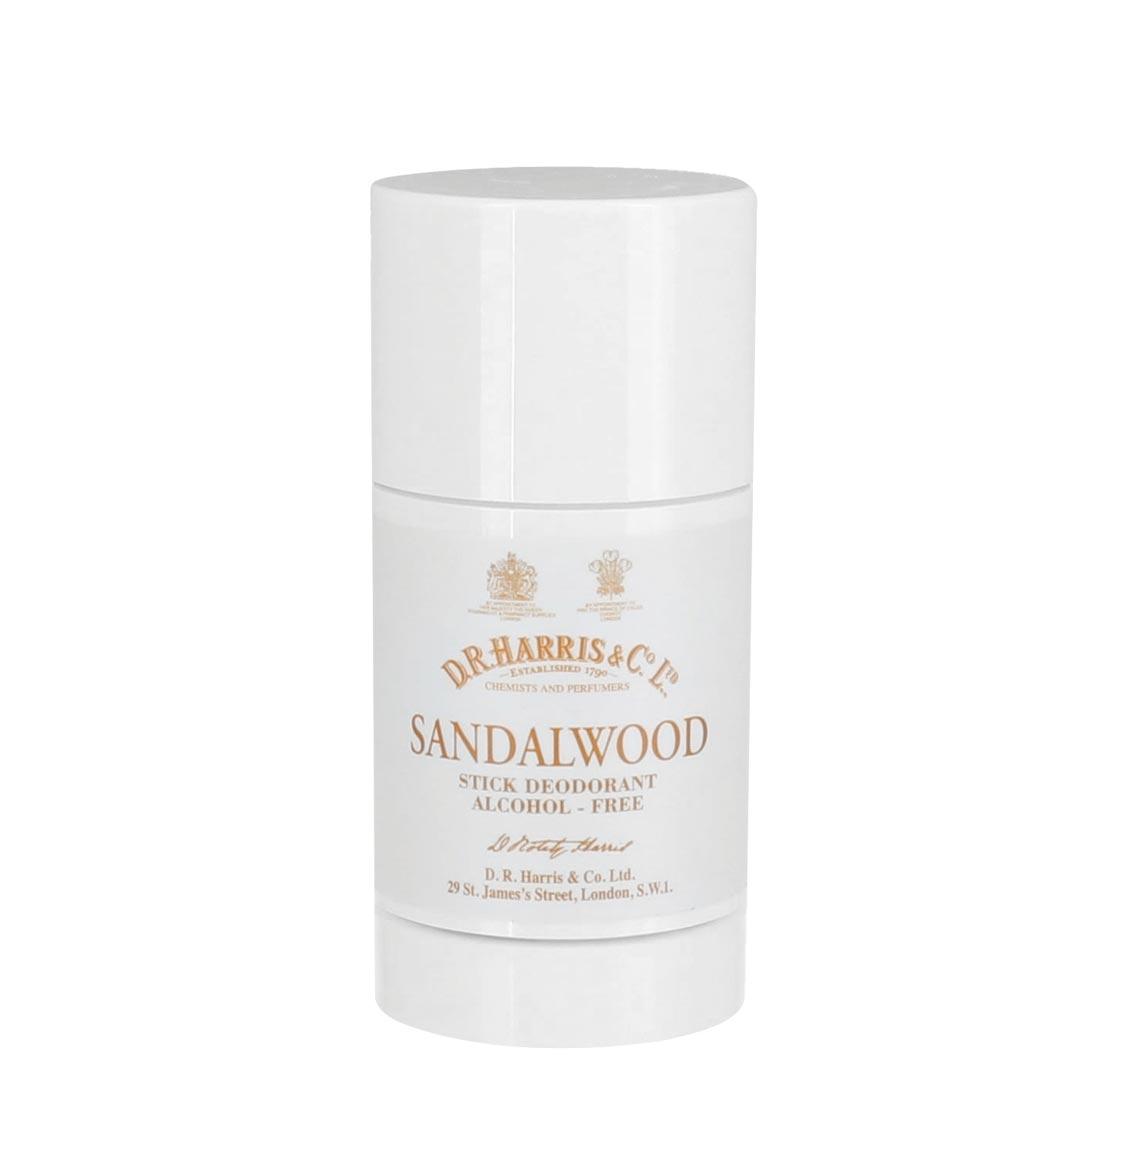 D R Harris Sandalwood Alcohol-Free Antiperspirant Deodorant Stick 75g